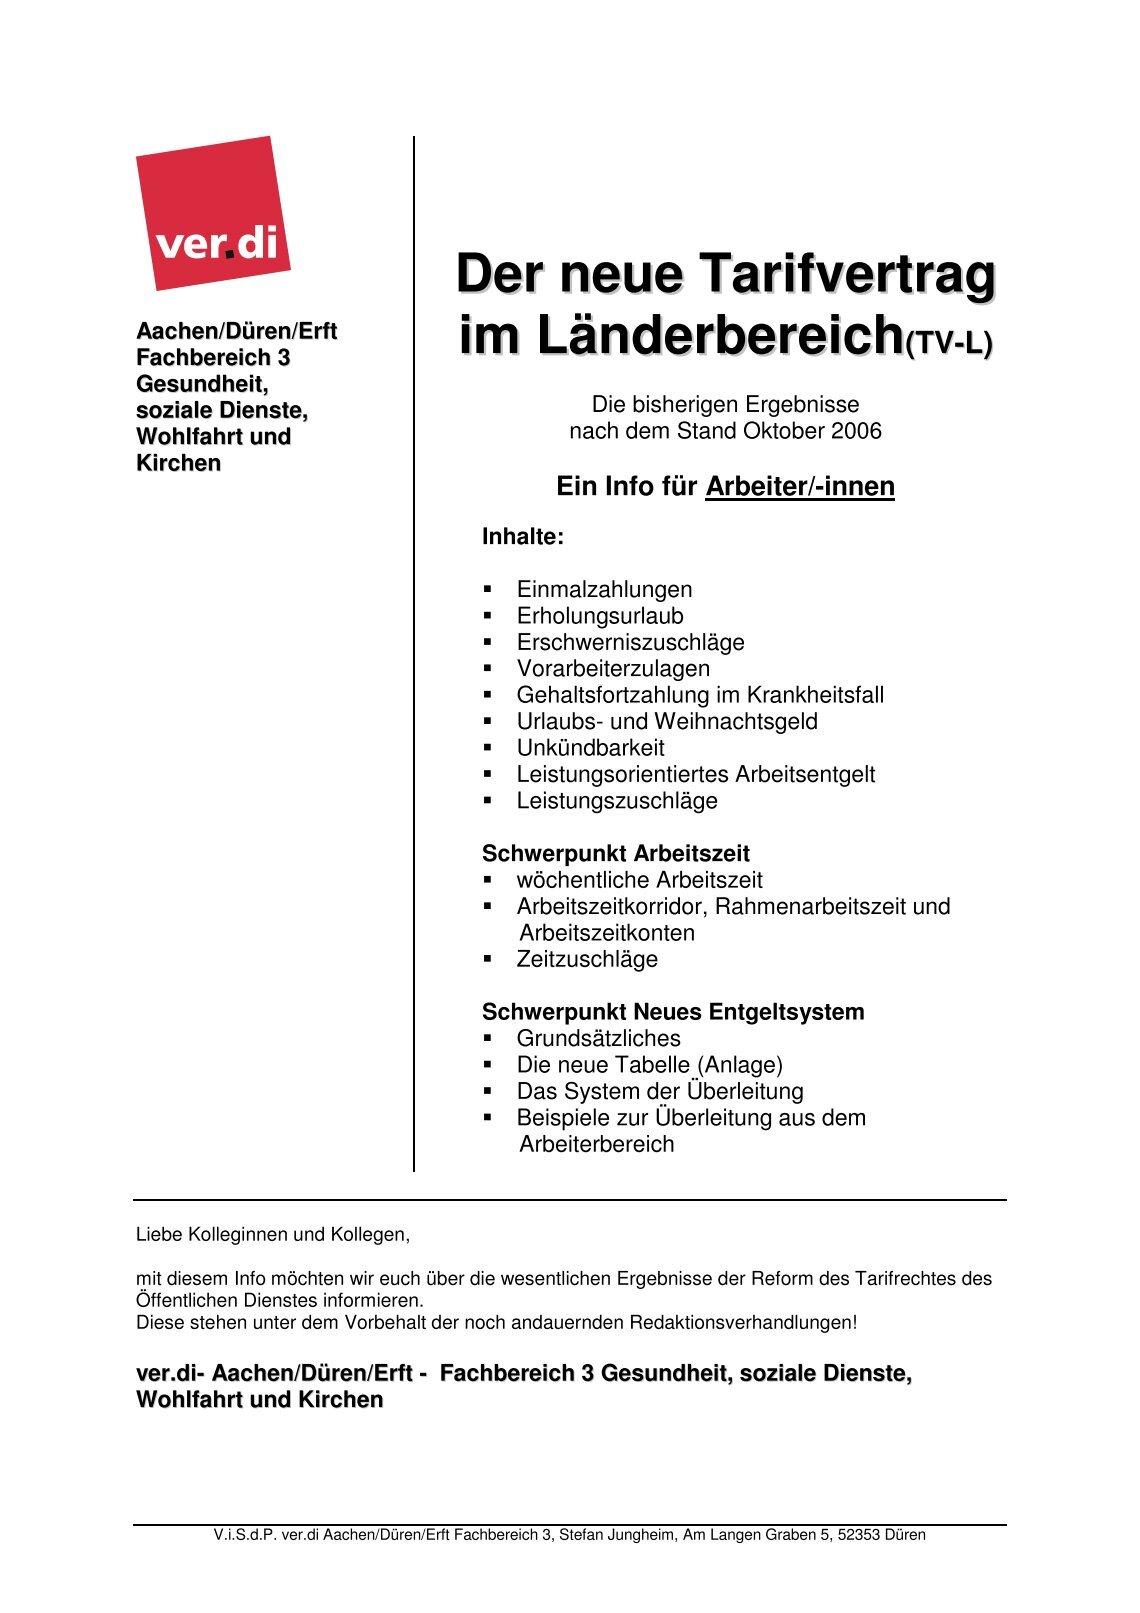 40 free Magazines from UNIKUM.AACHEN.DE